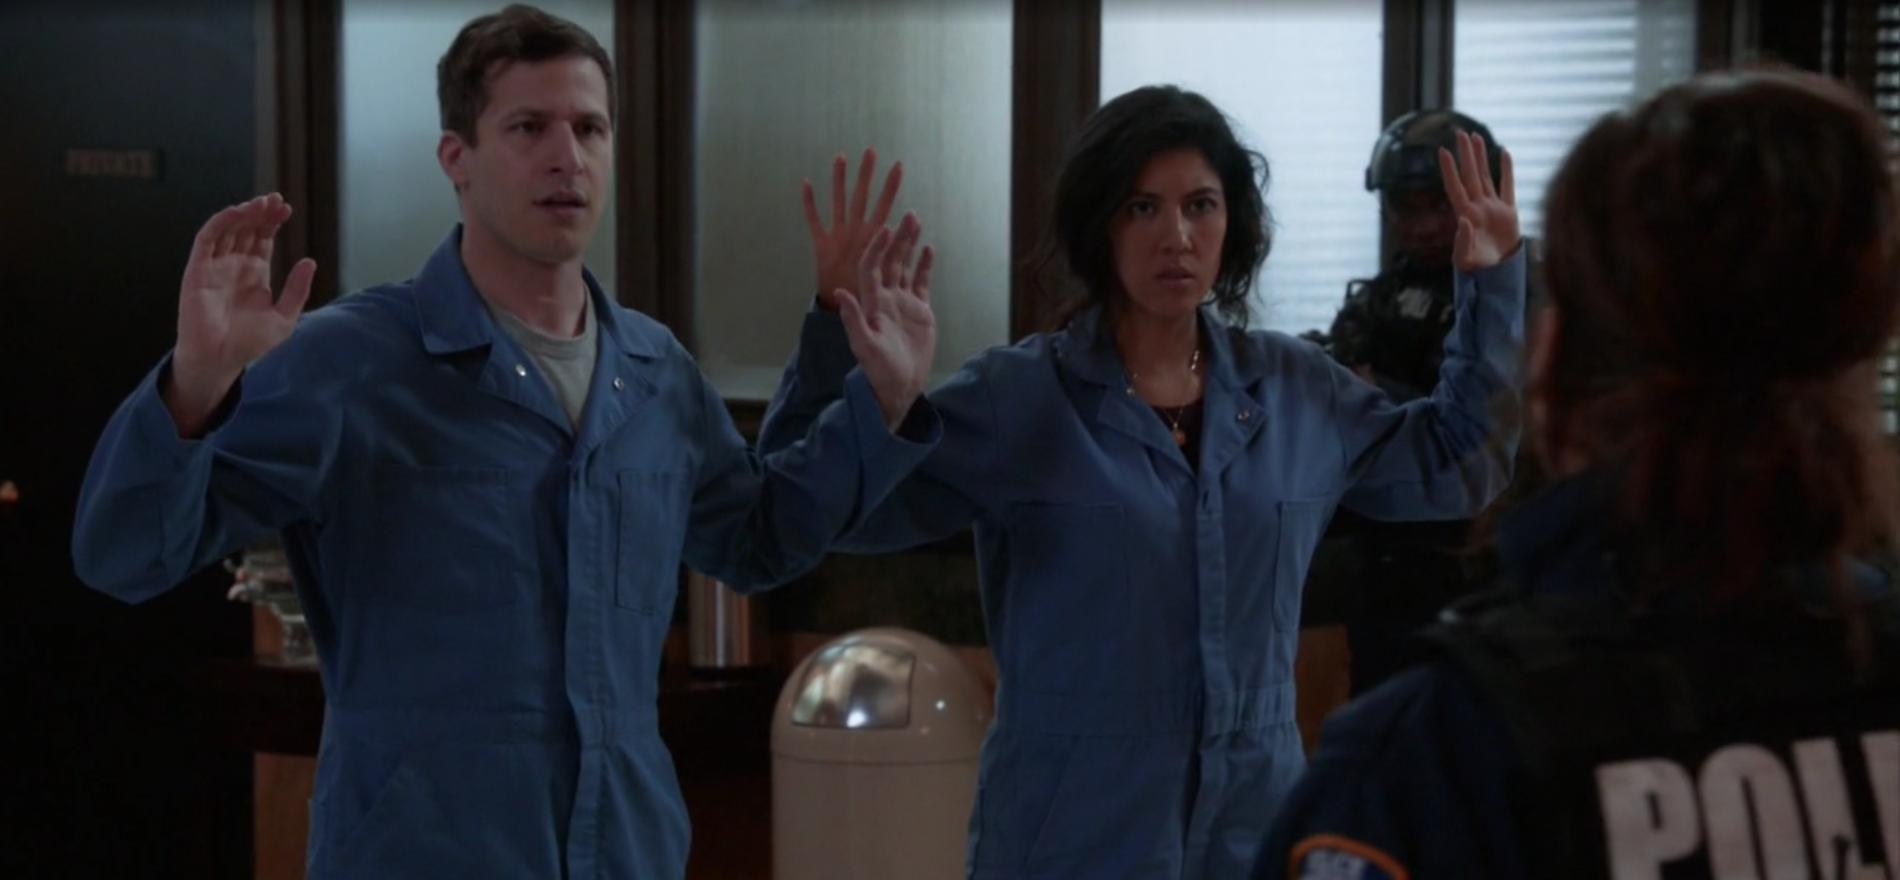 Brooklyn Nine-Nine: The Bank Job | Season 4 | Episode 21